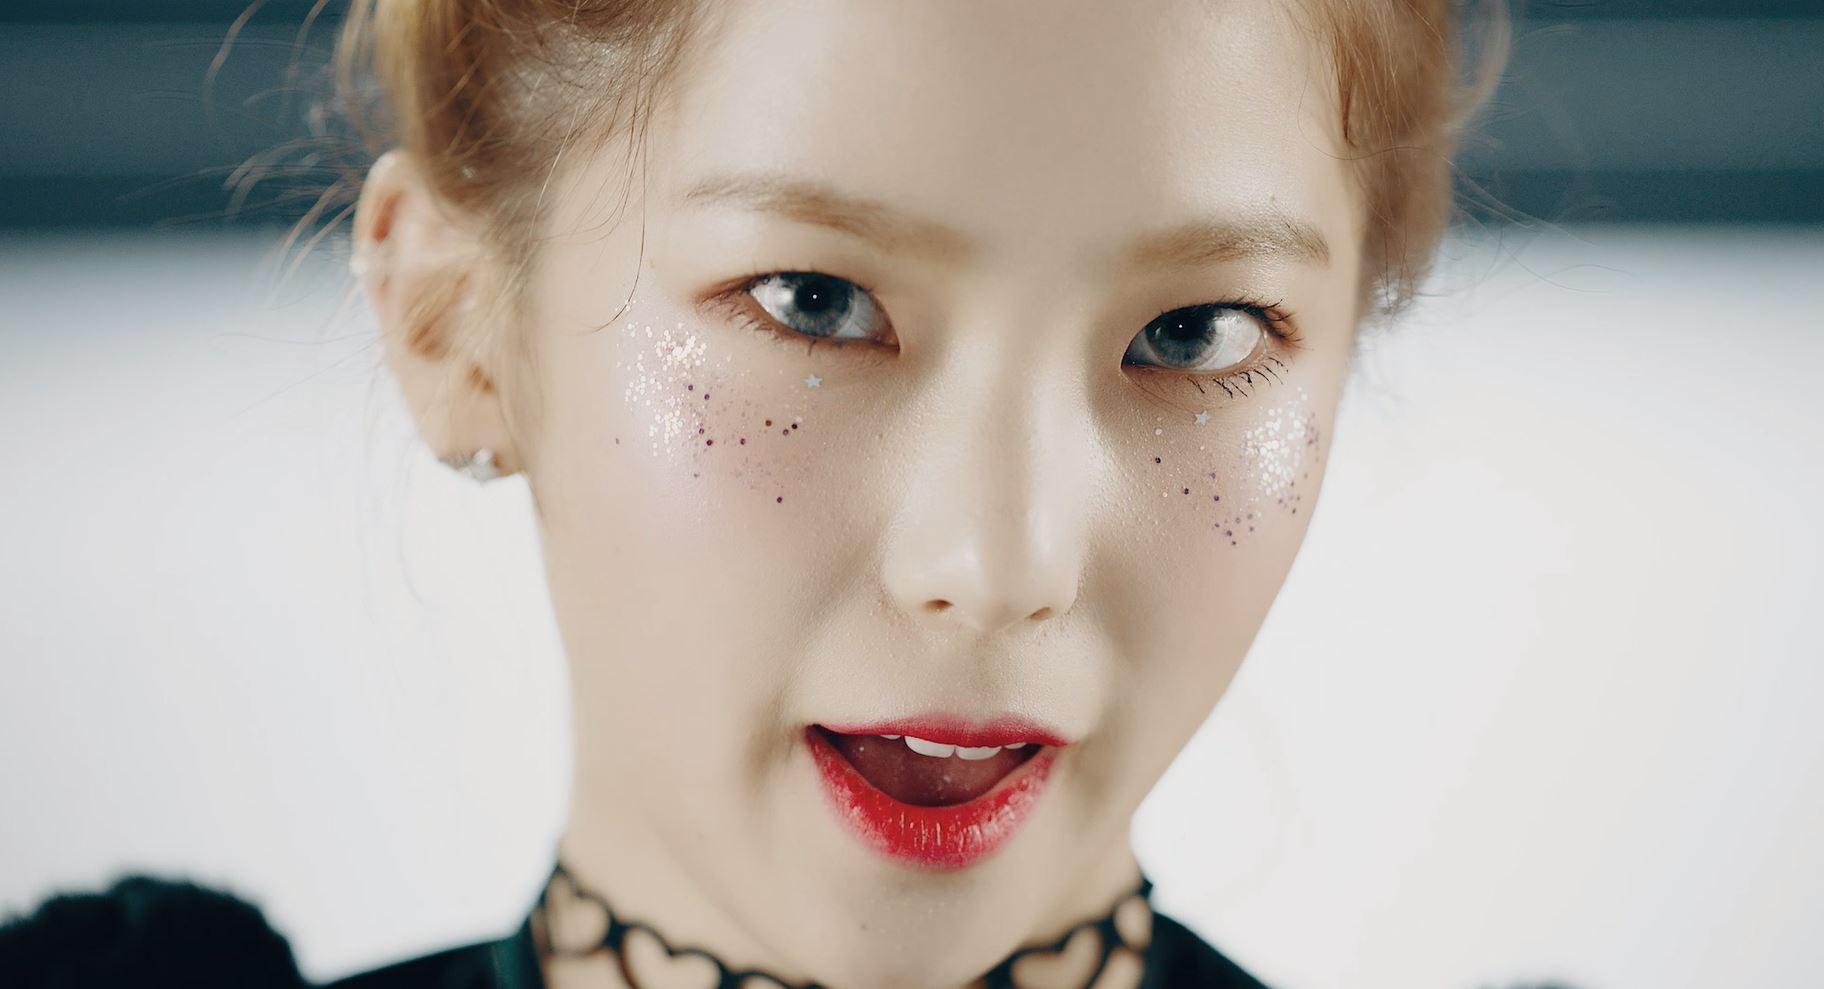 CLC - '도깨비(Hobgoblin)' Official Music Video